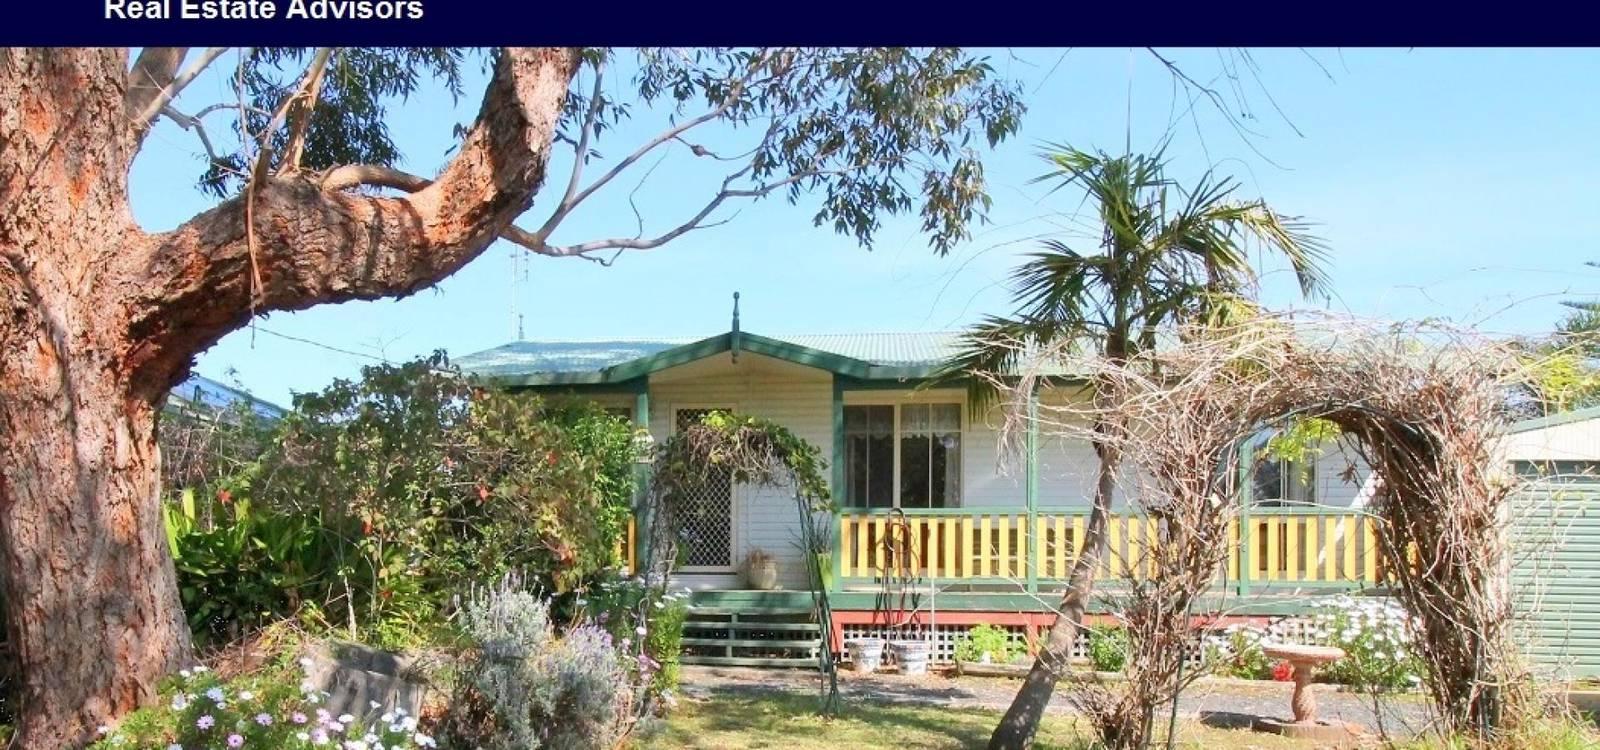 17 Coogee Street TUROSS HEAD, NSW 2537 - photo 1